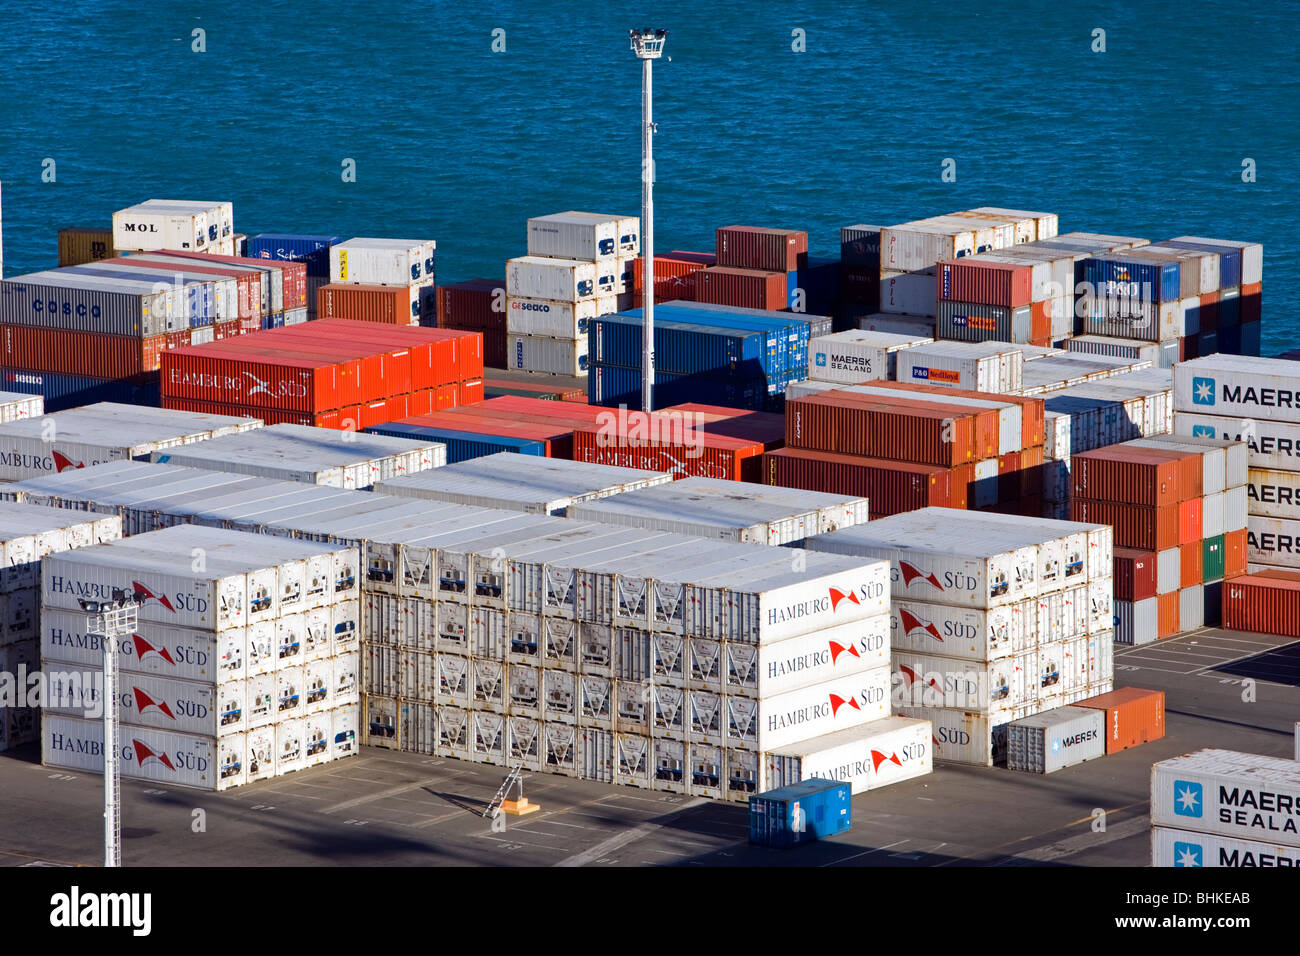 Port of Napier, New Zealand Stock Photo